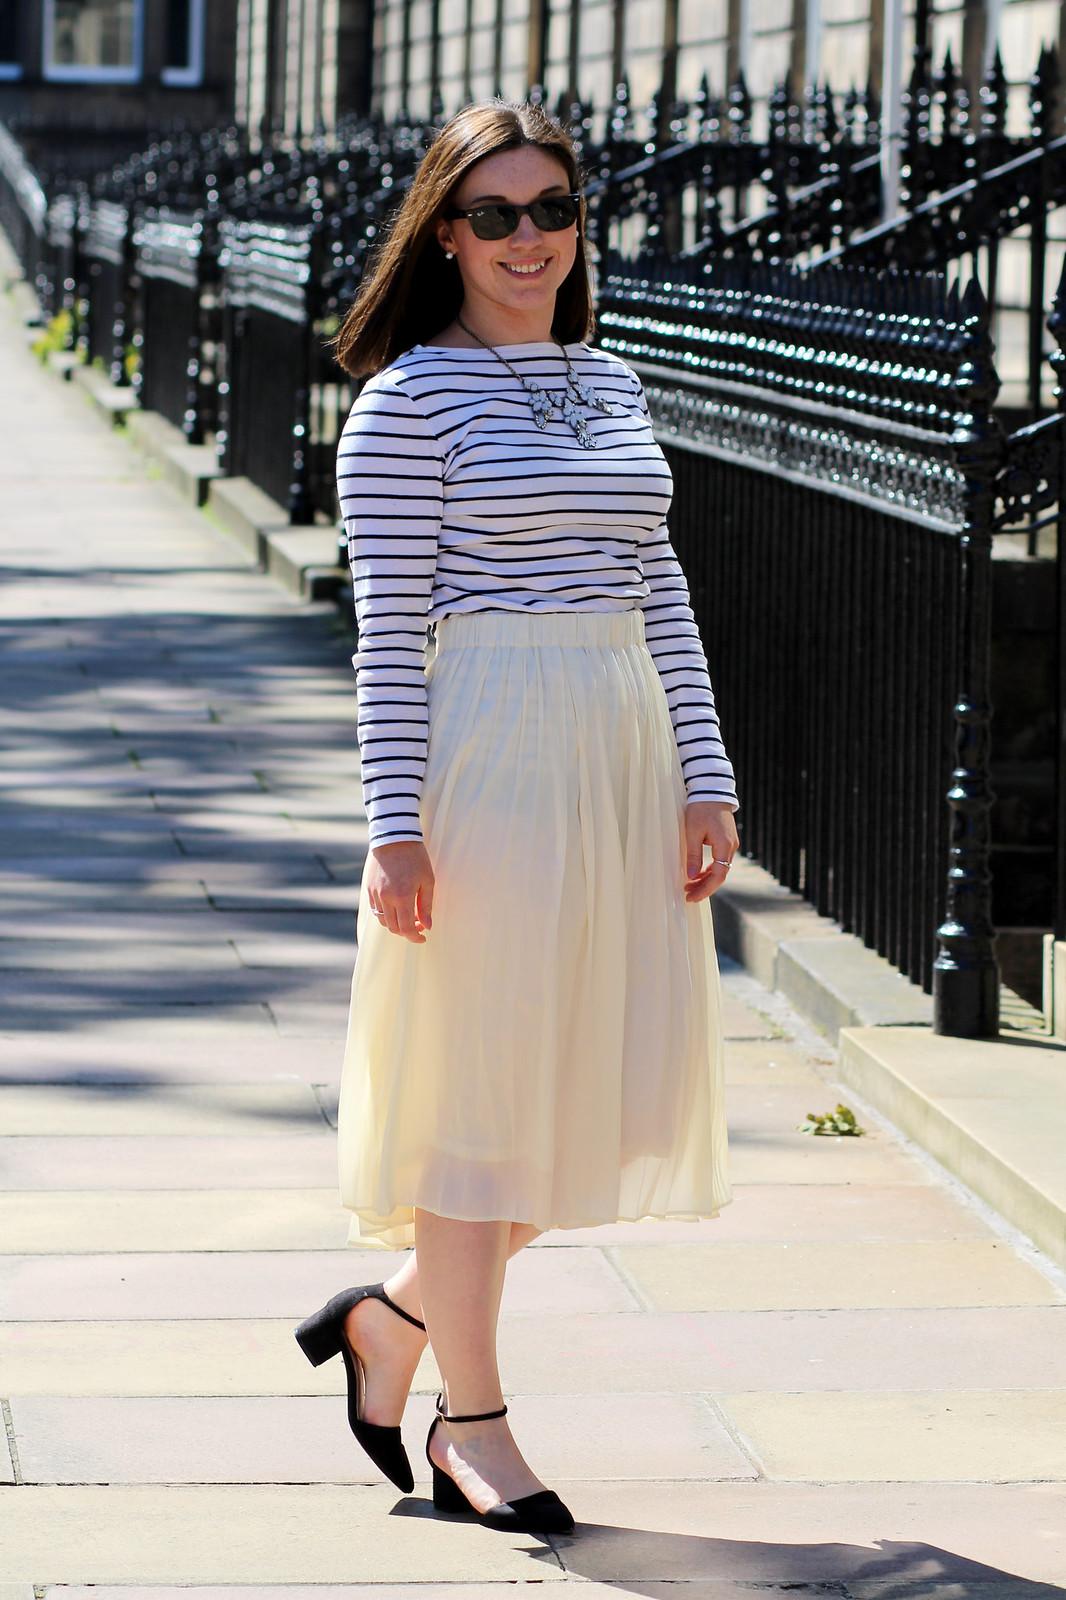 The Little Things UK Edinburgh Fashion Blogger Scotland